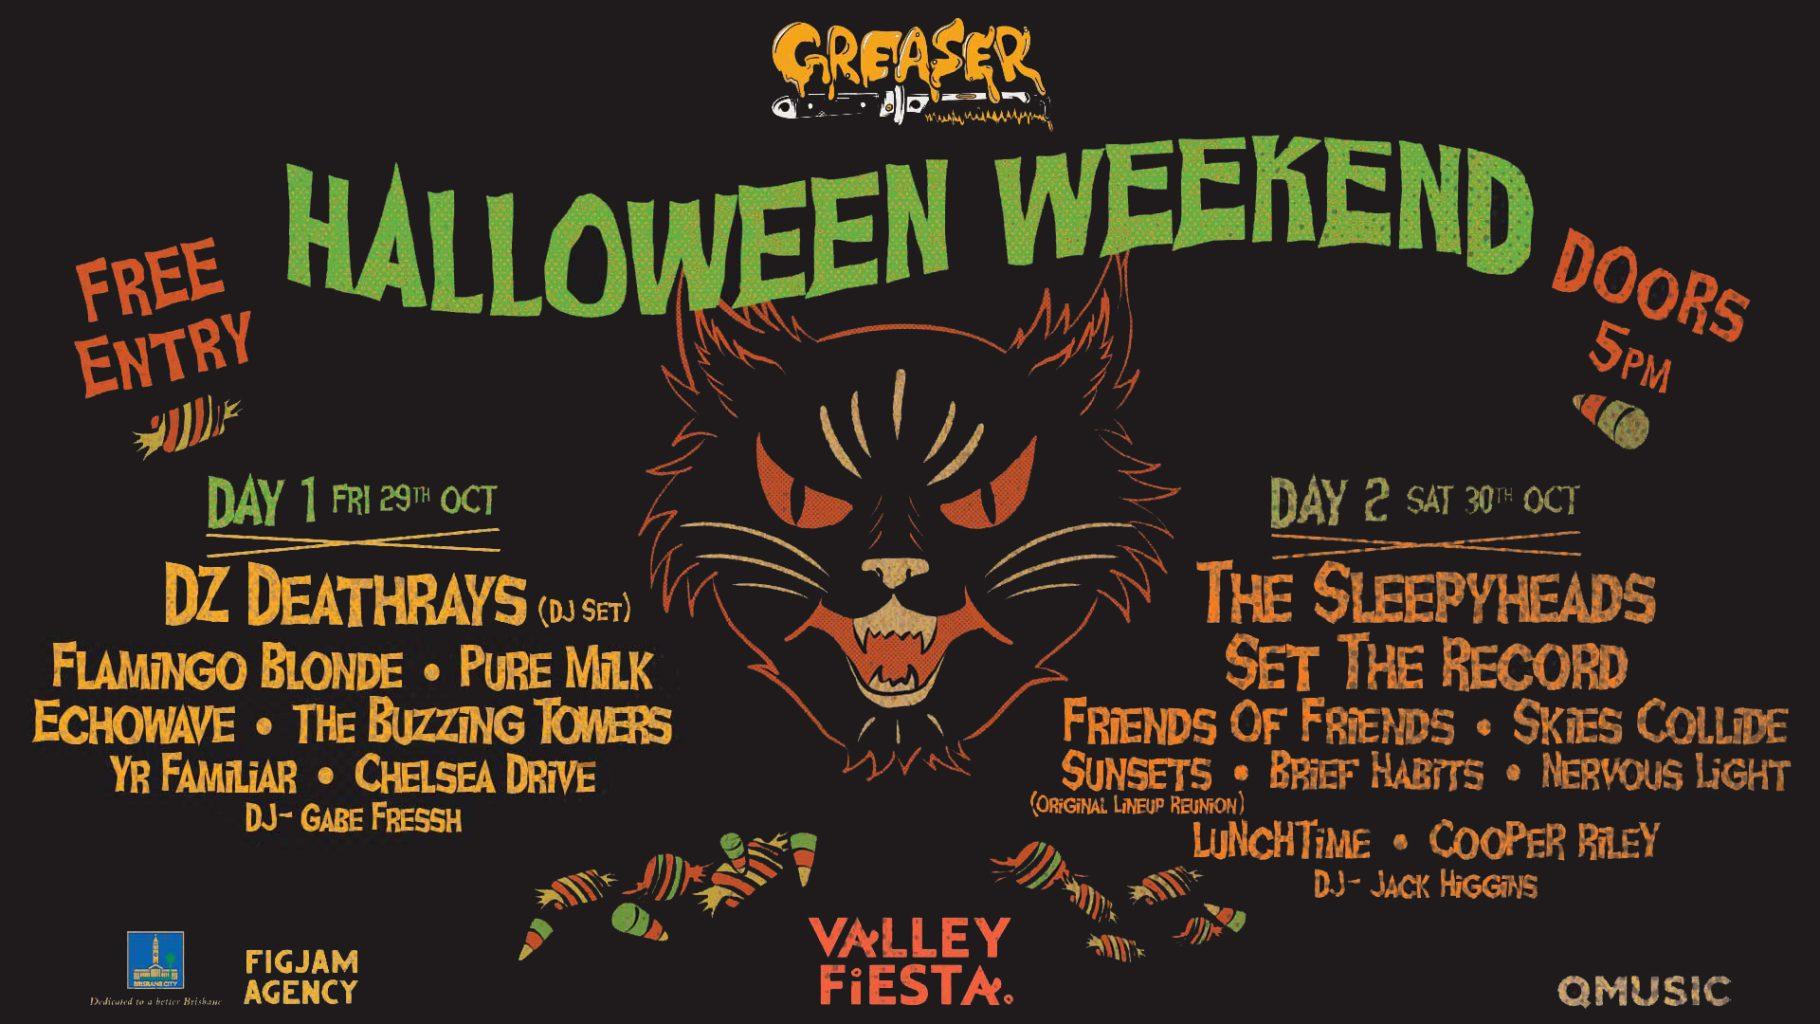 Greaser Halloween Weekend